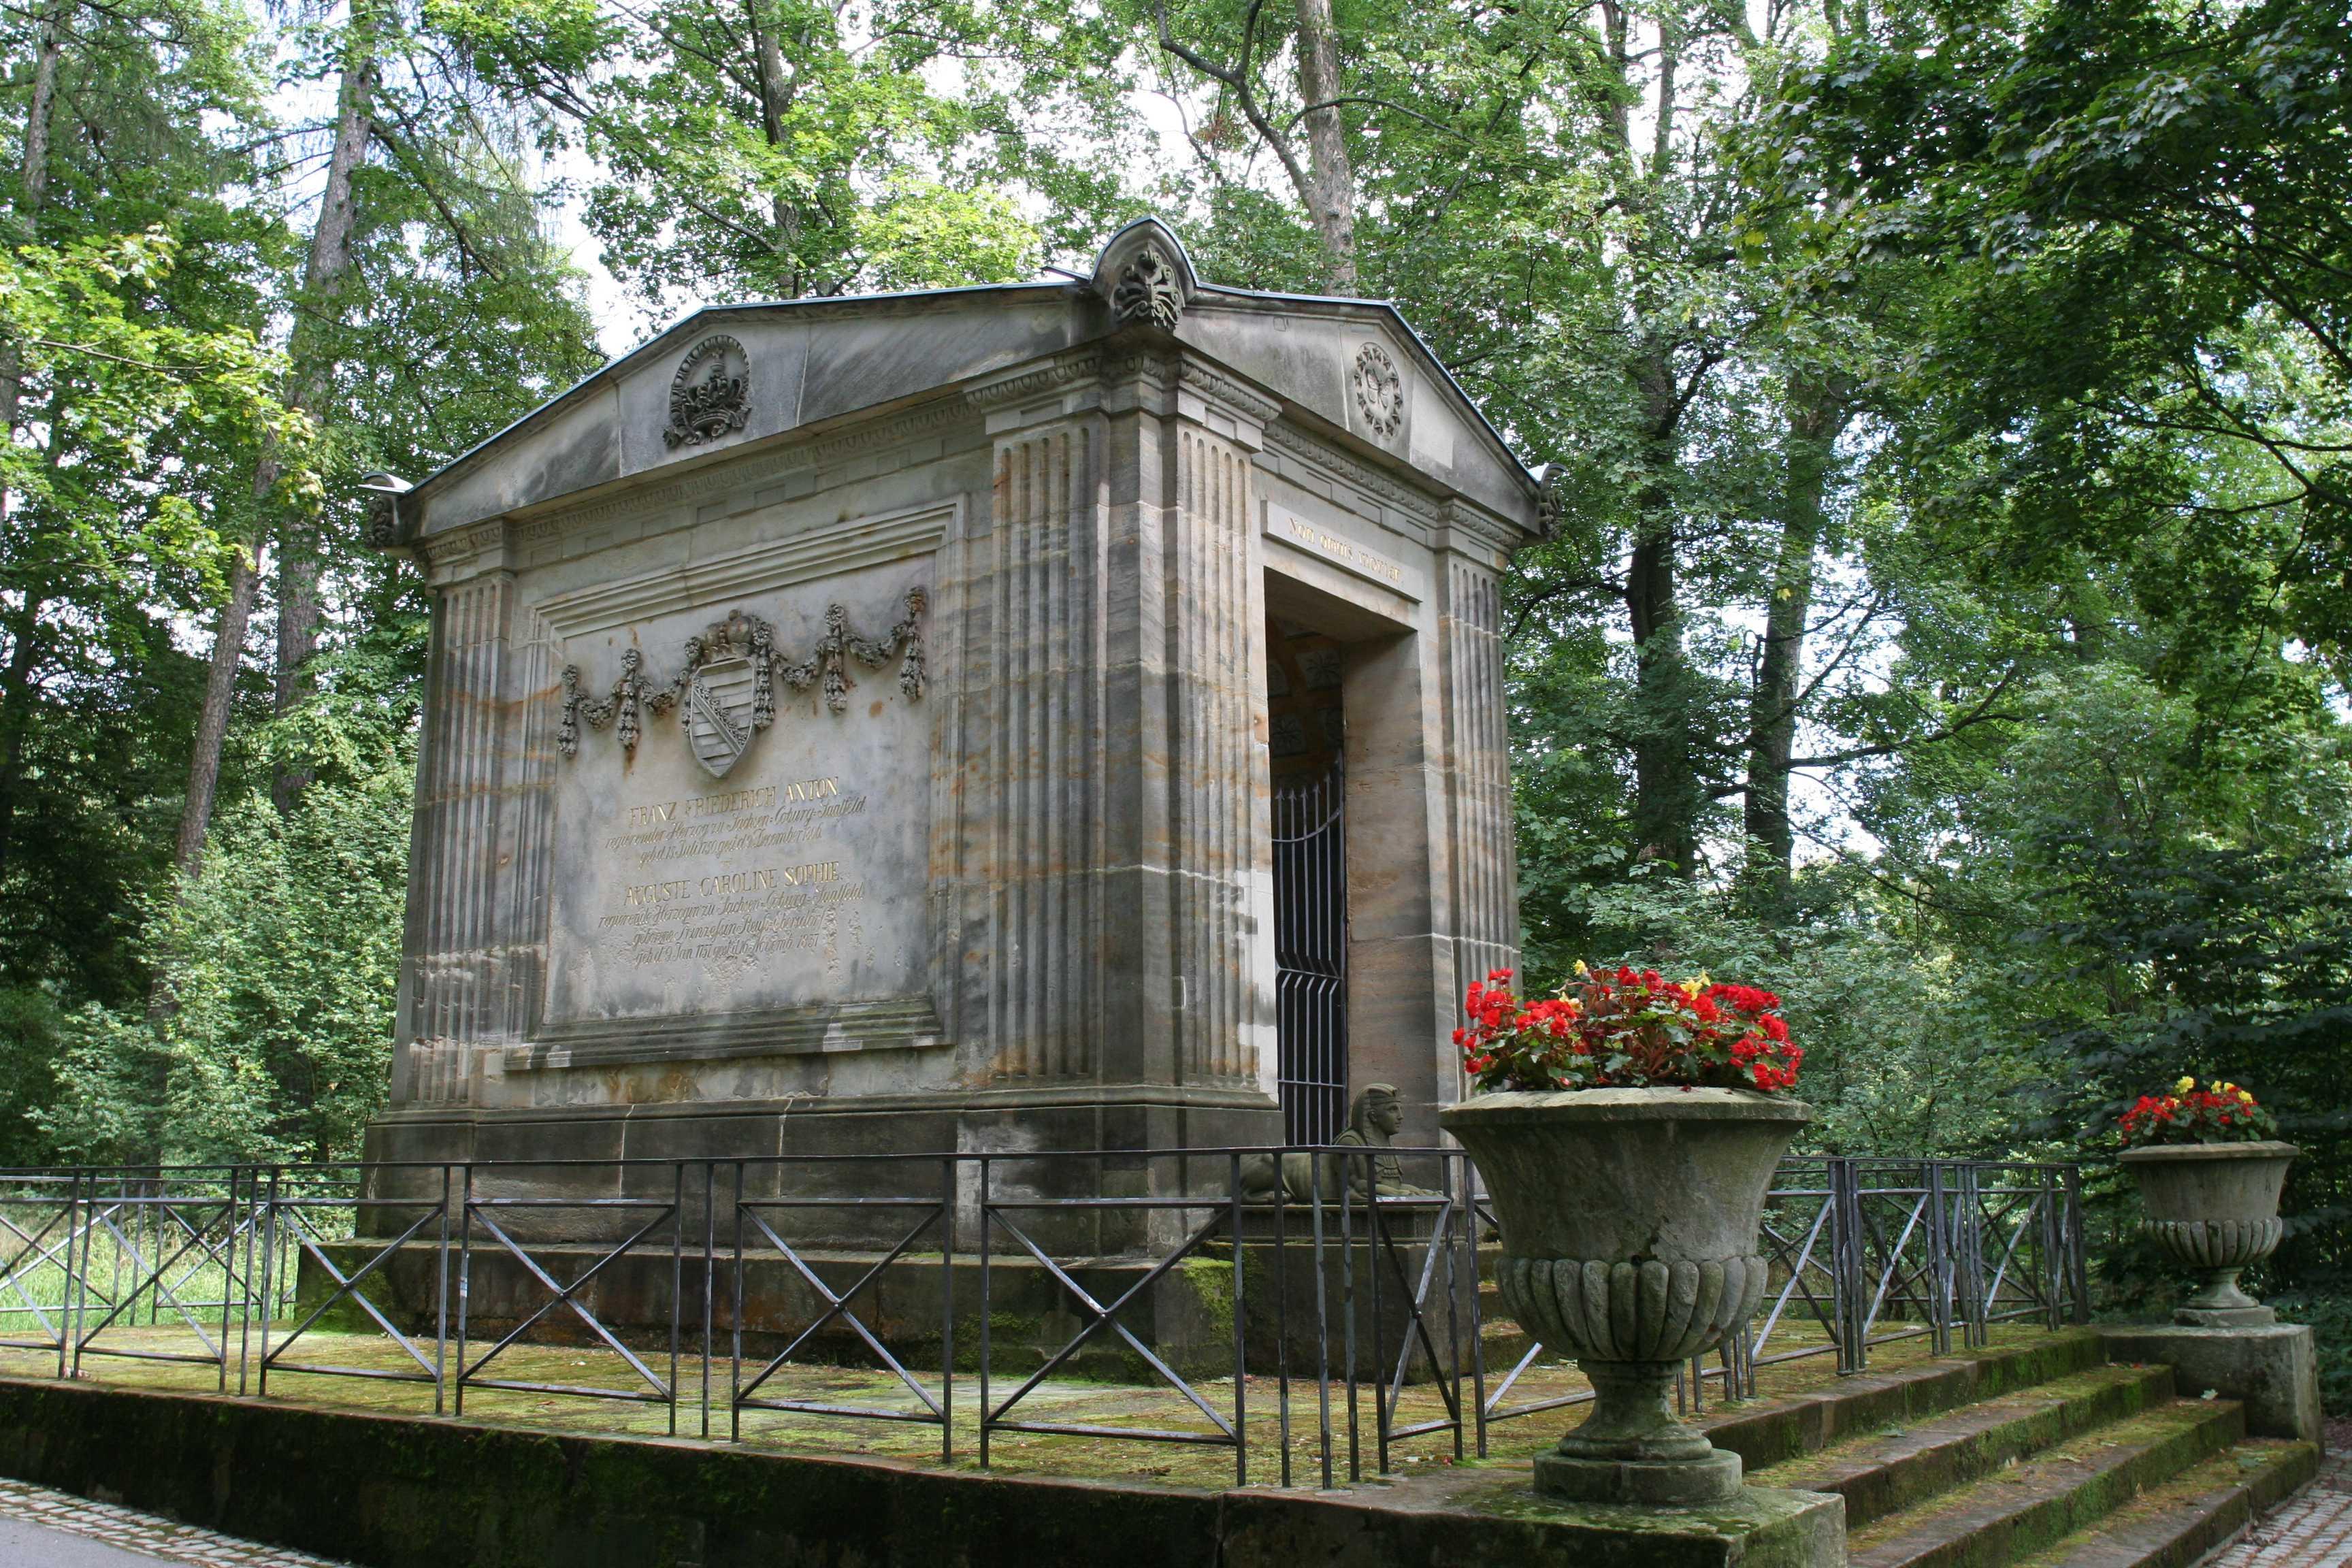 File:Coburg-Hofgarten-Mausoleum.jpg - Wikimedia Commons